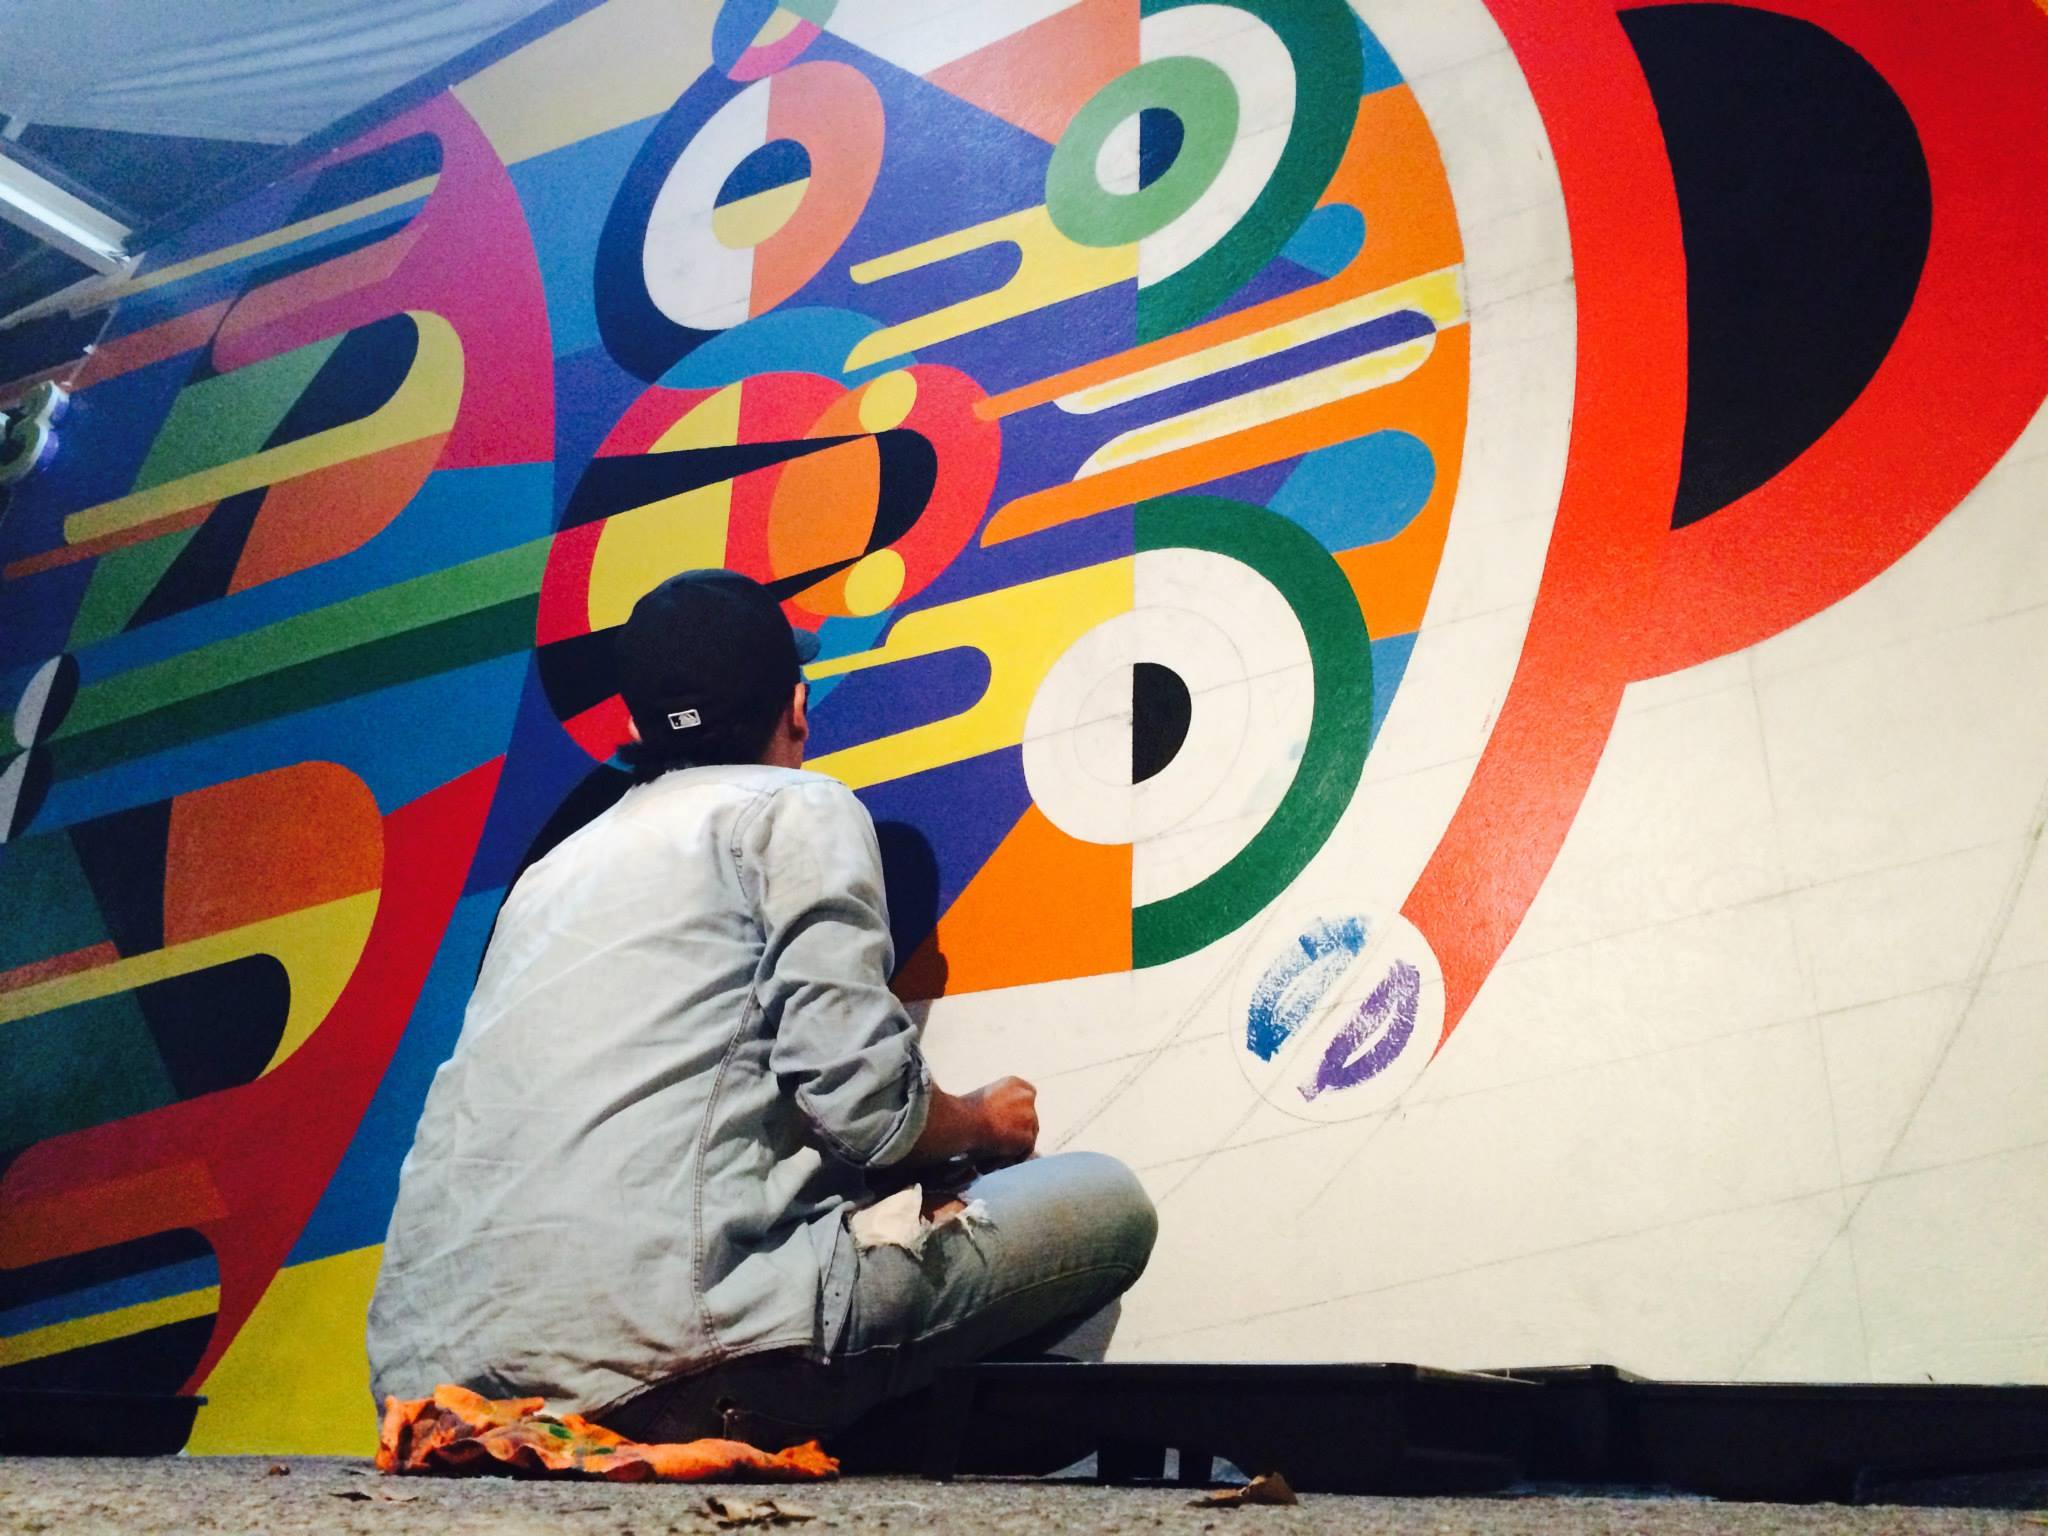 petri pirata comex arto geometric art billboard